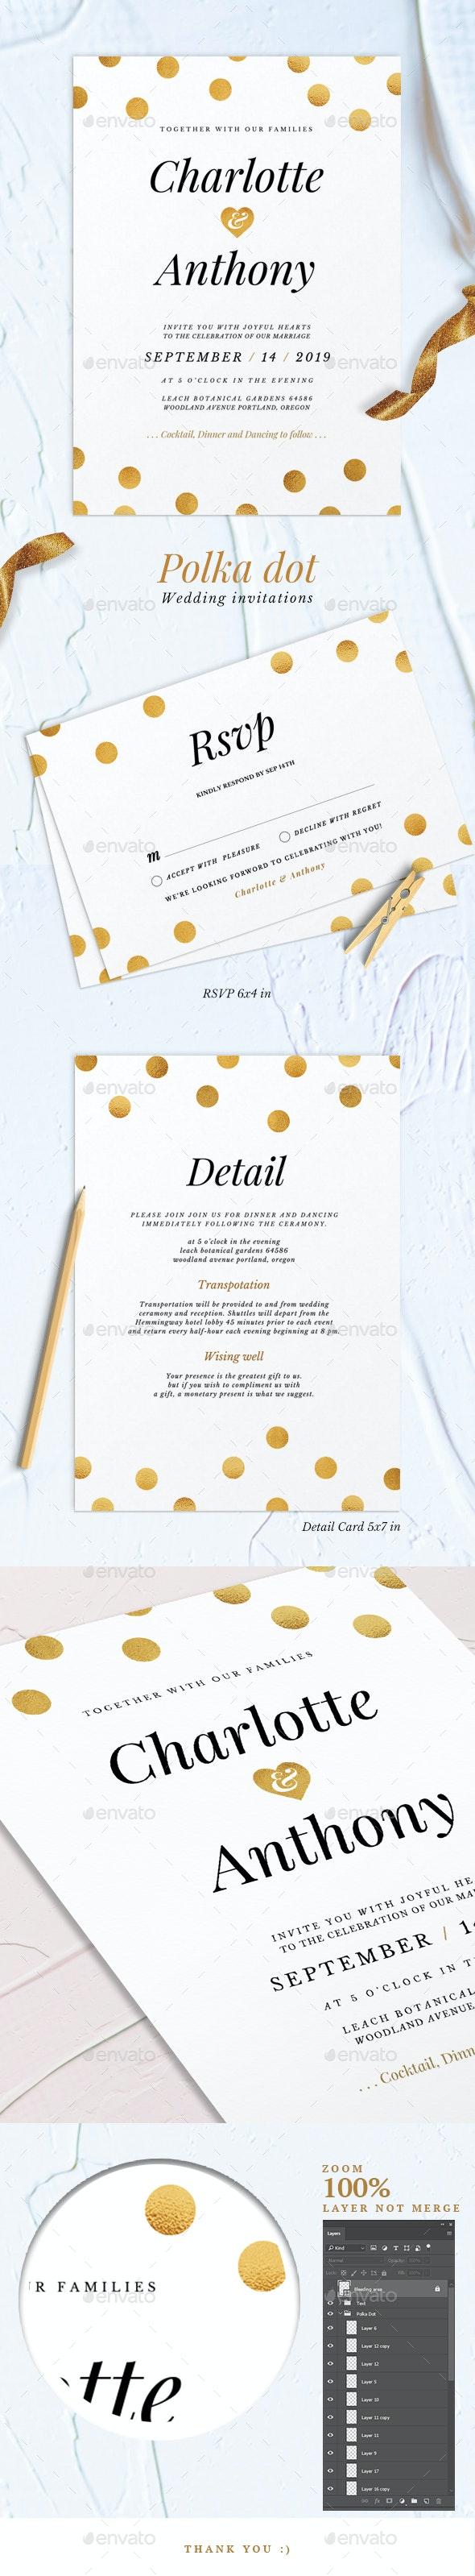 Polka dot Wedding Invitations - Weddings Cards & Invites